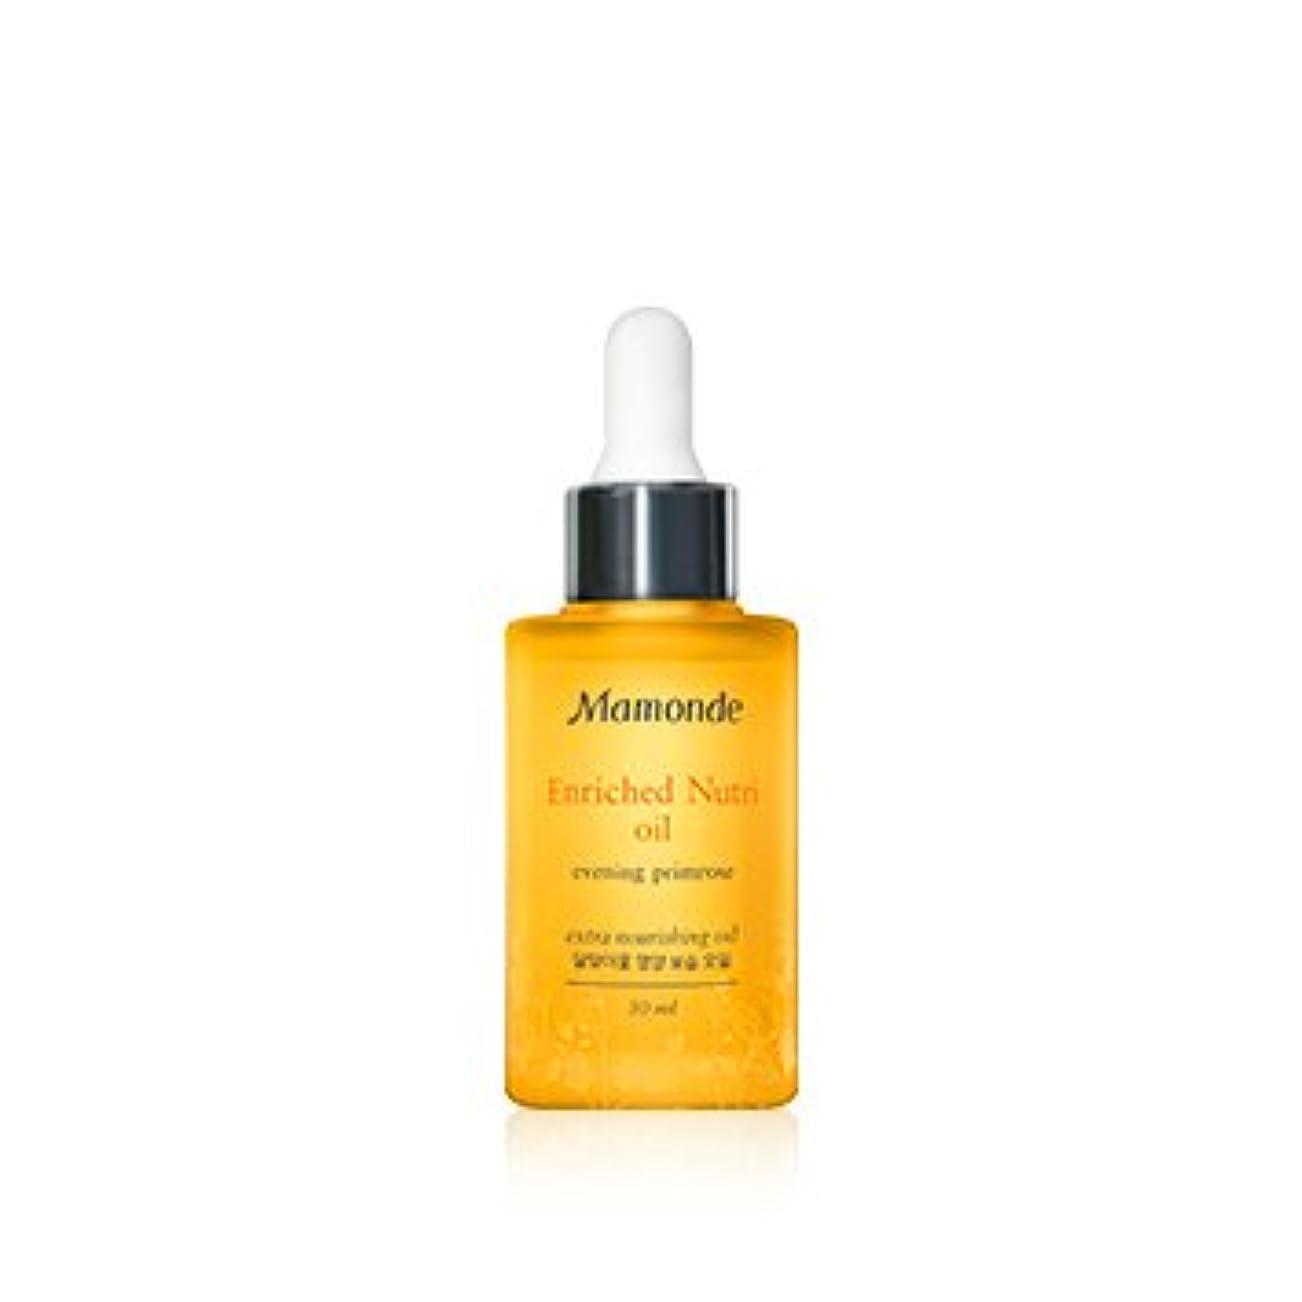 [New] Mamonde Enriched Nutri Oil 30ml/マモンド エンリッチド ニュートリ オイル 30ml [並行輸入品]